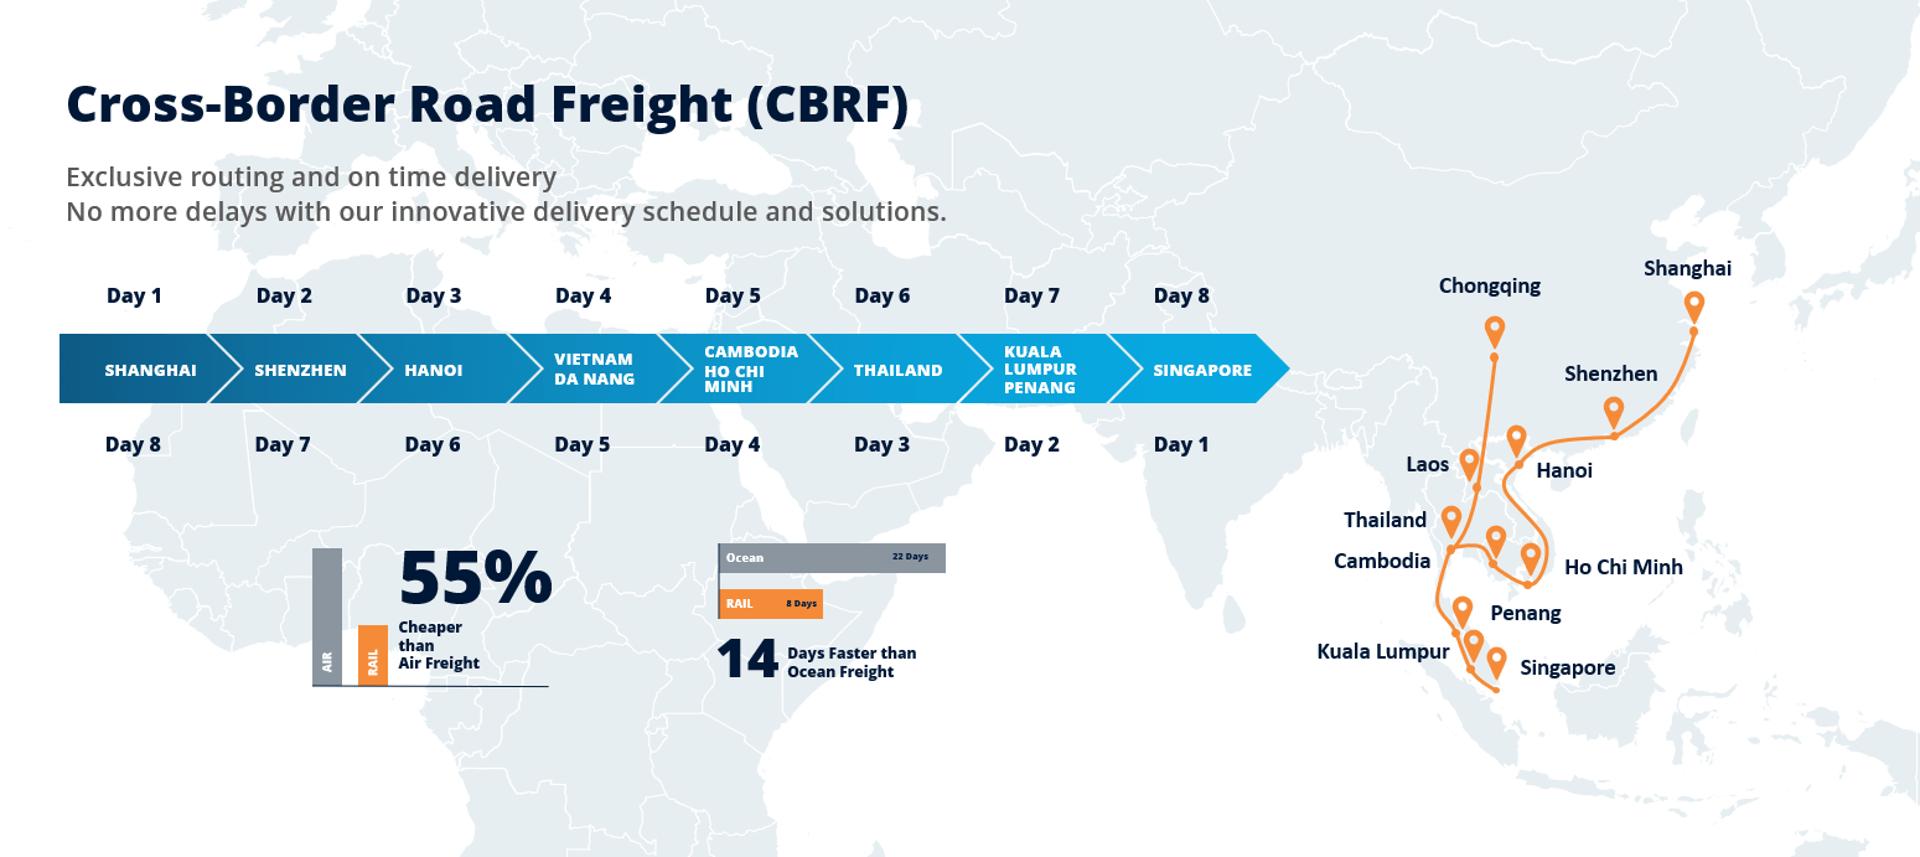 Cross-Border Road Freight